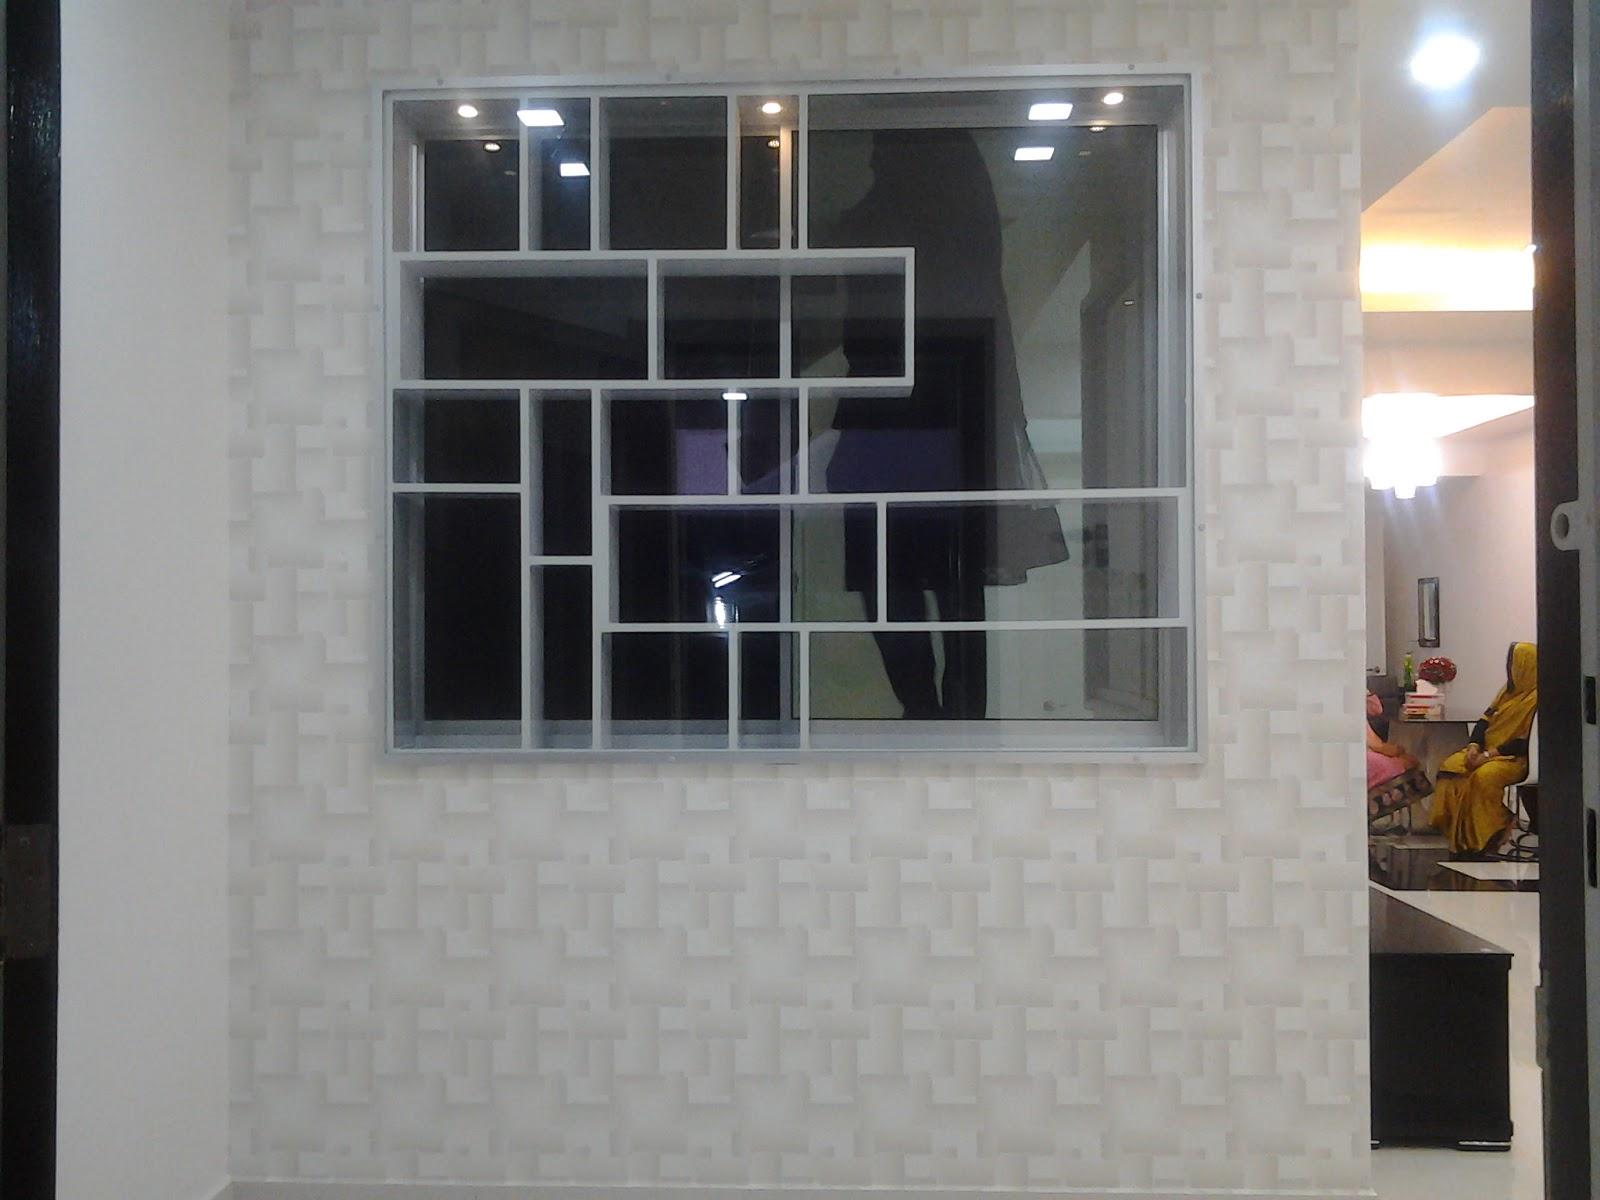 Repair Sofa Shah Alam American Leather Queen Sleeper Wallpaper Toke Restauran Baiti Jannati Deco